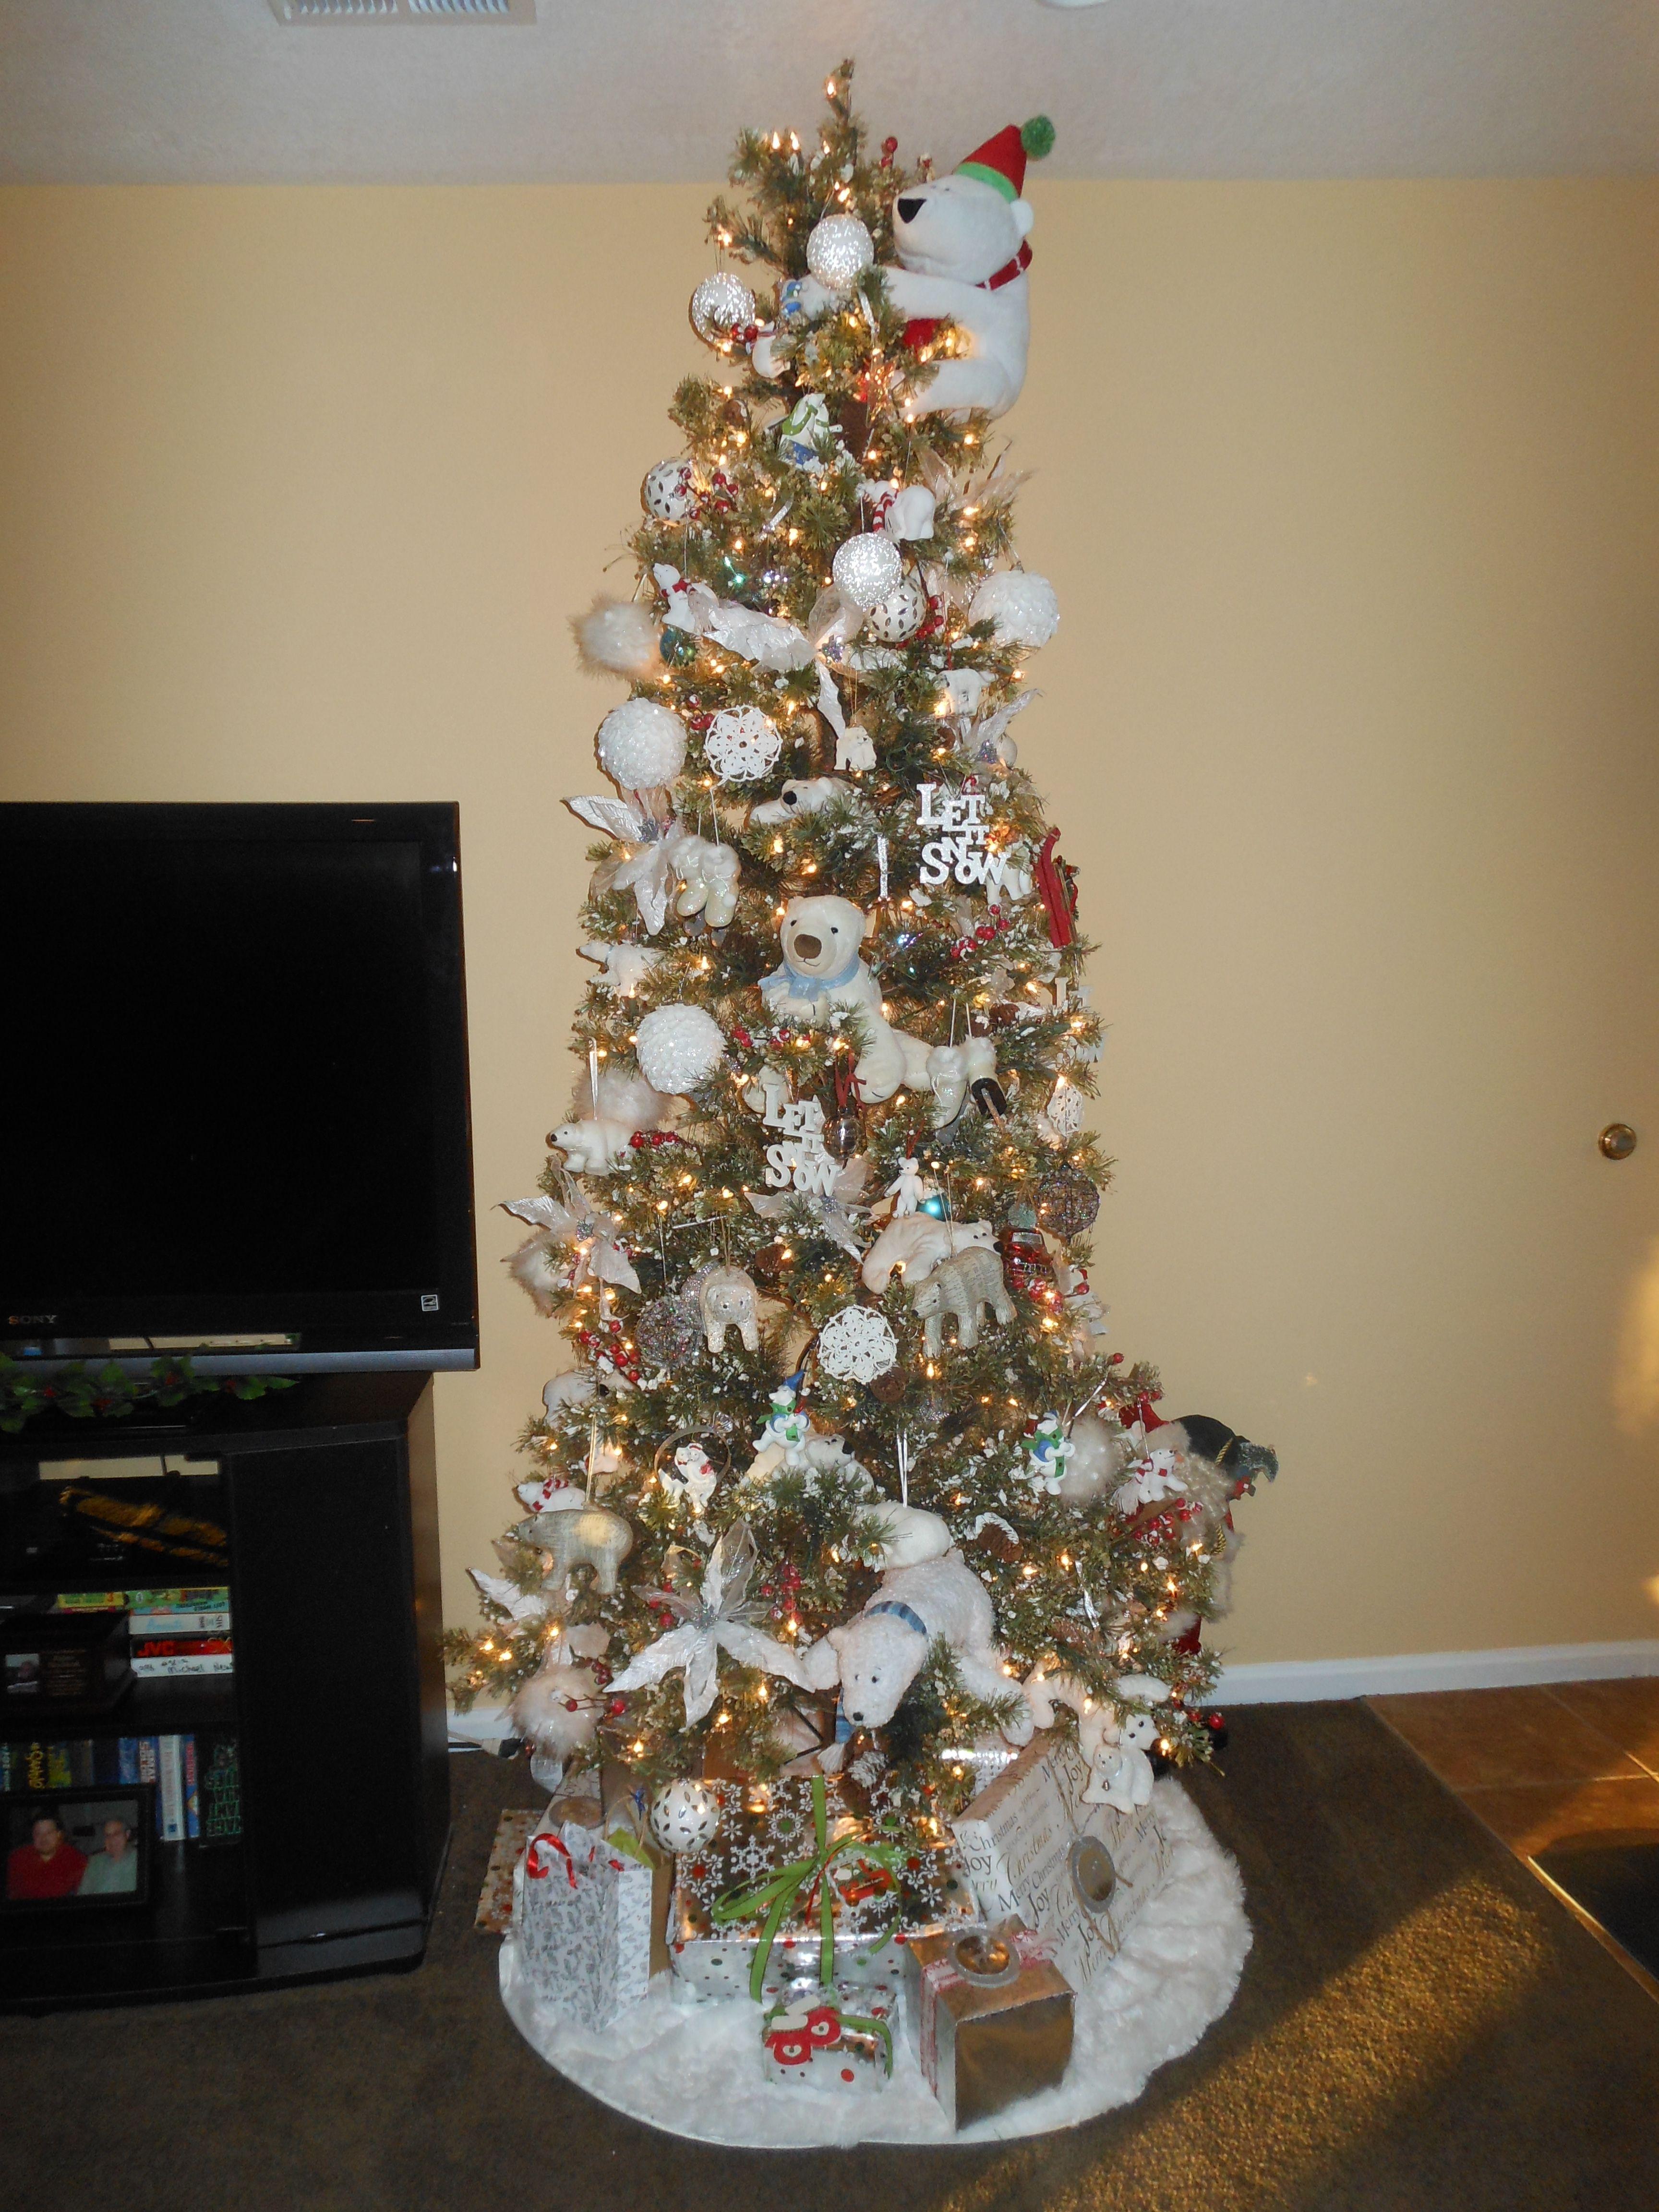 Christmas decorations pinterest - Polar Bear Christmas Decorations On Pinterest Polar Bears